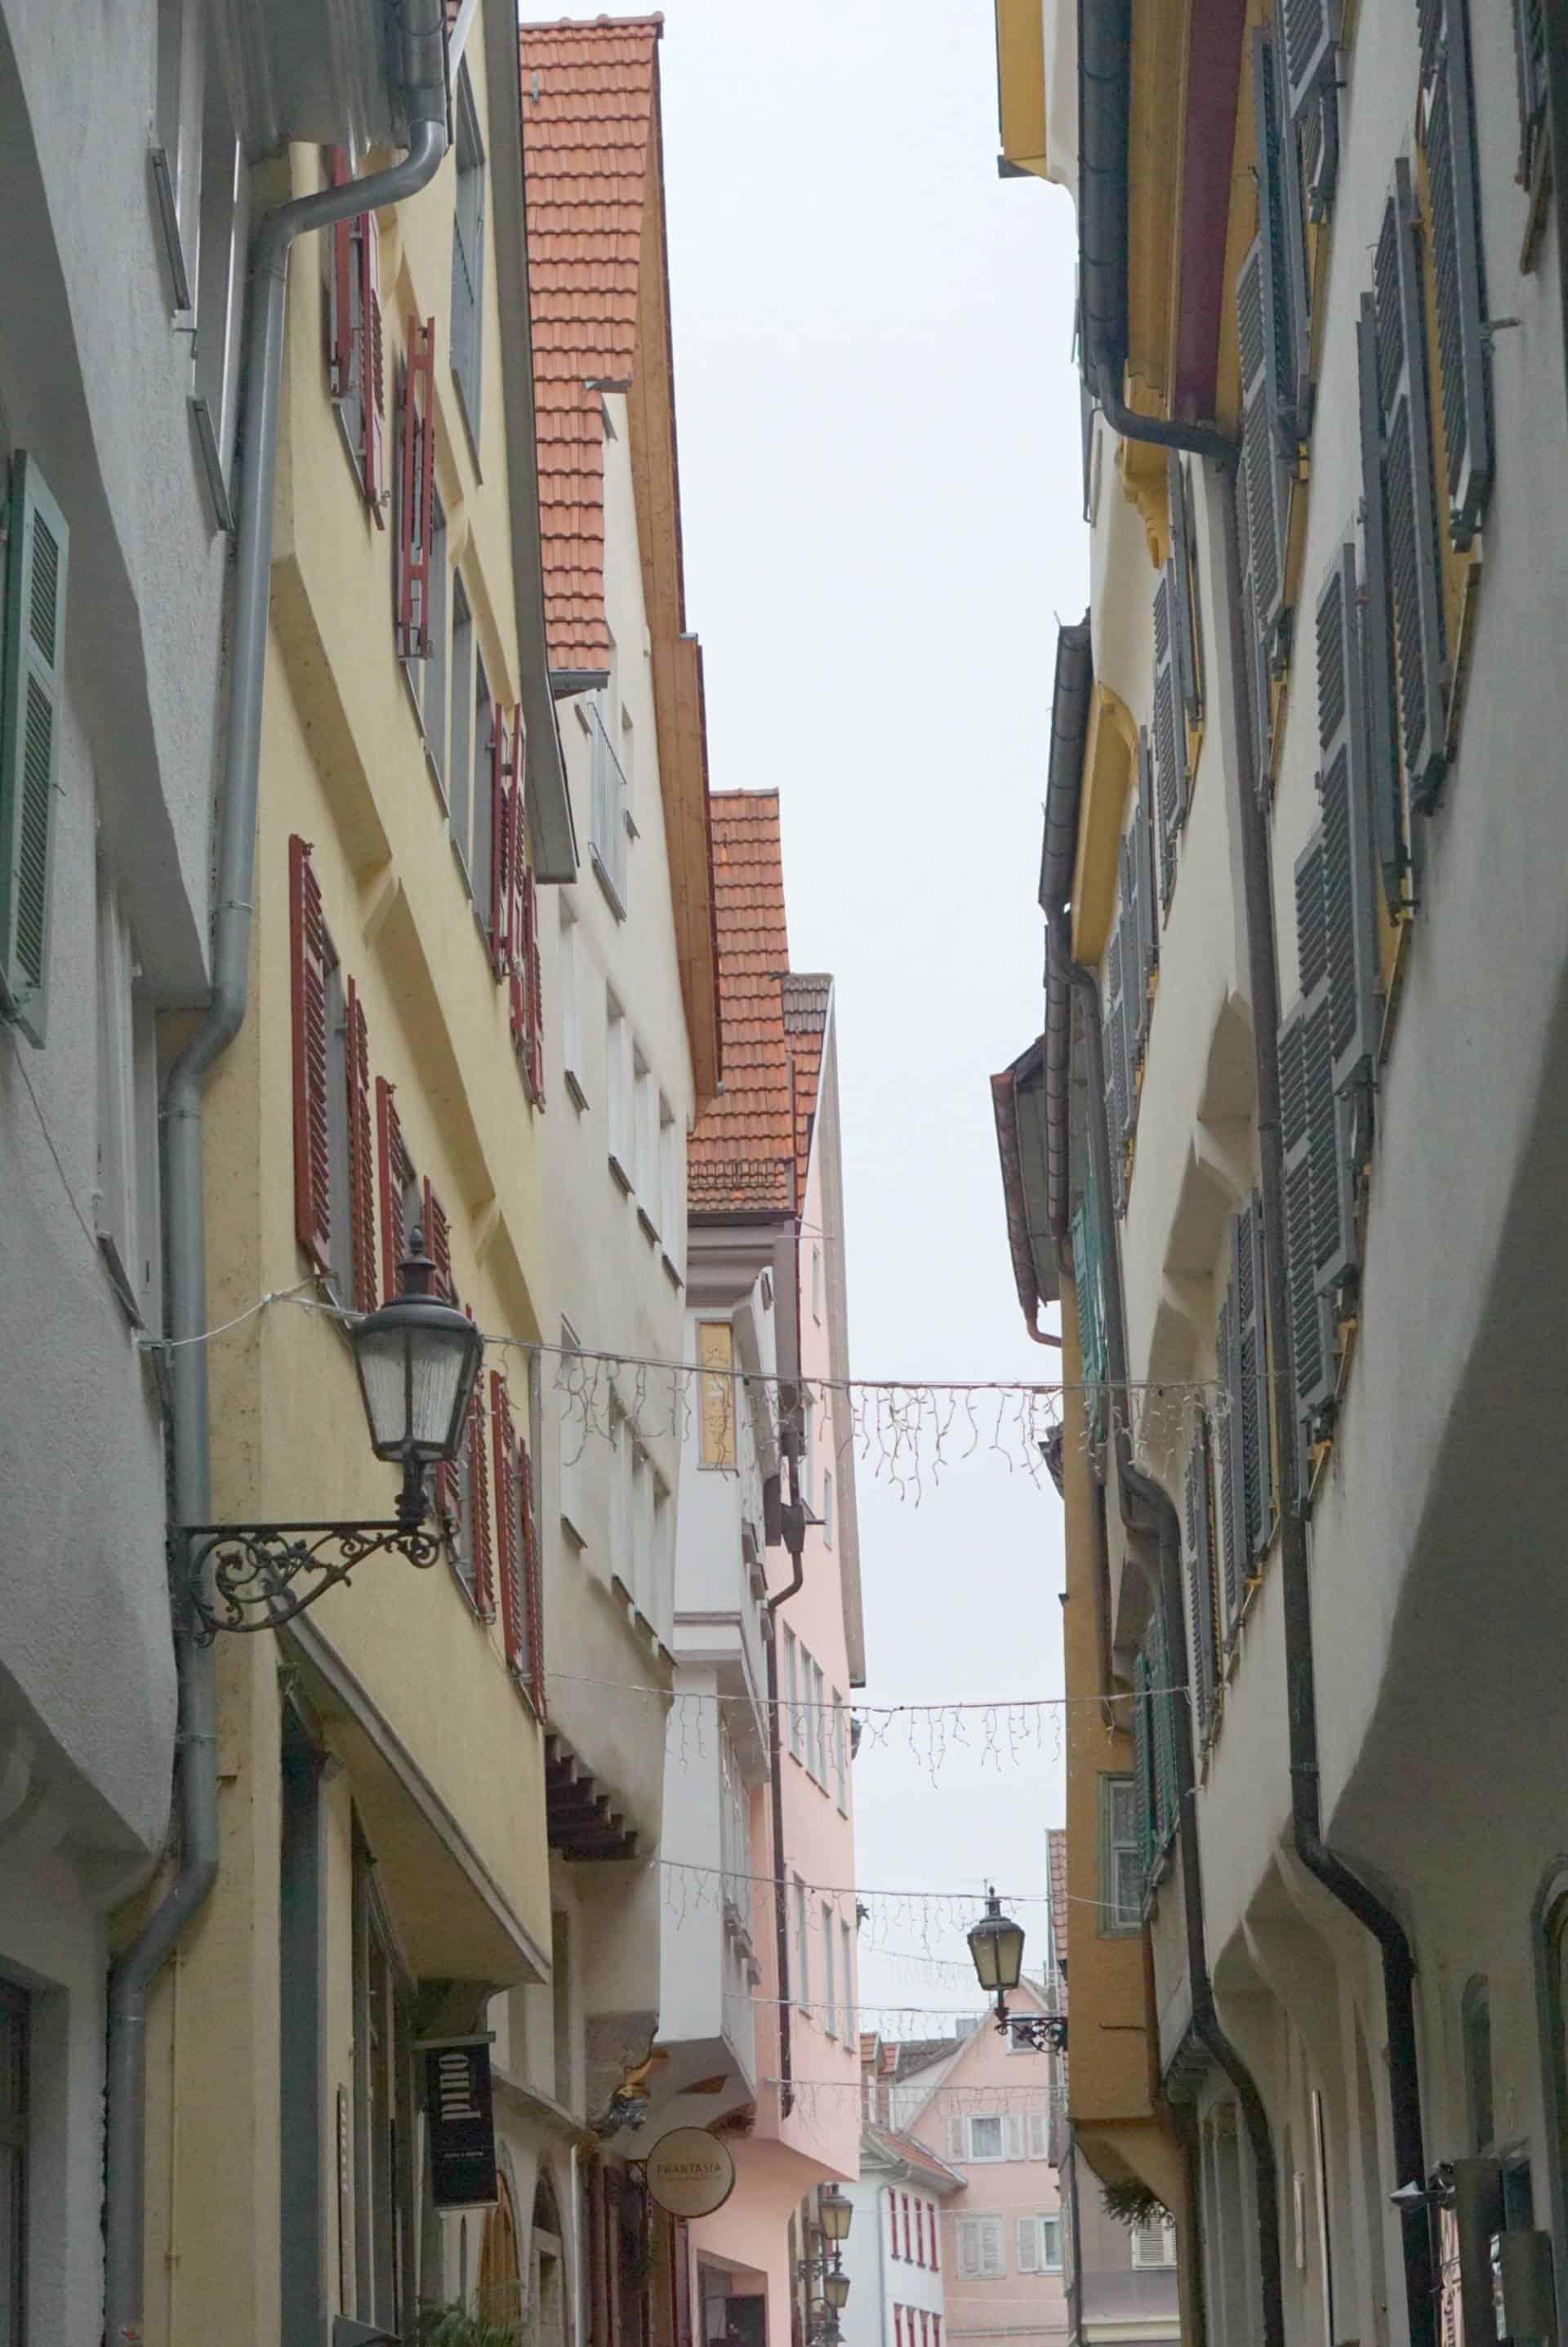 A Walk Around Esslingen In Germany